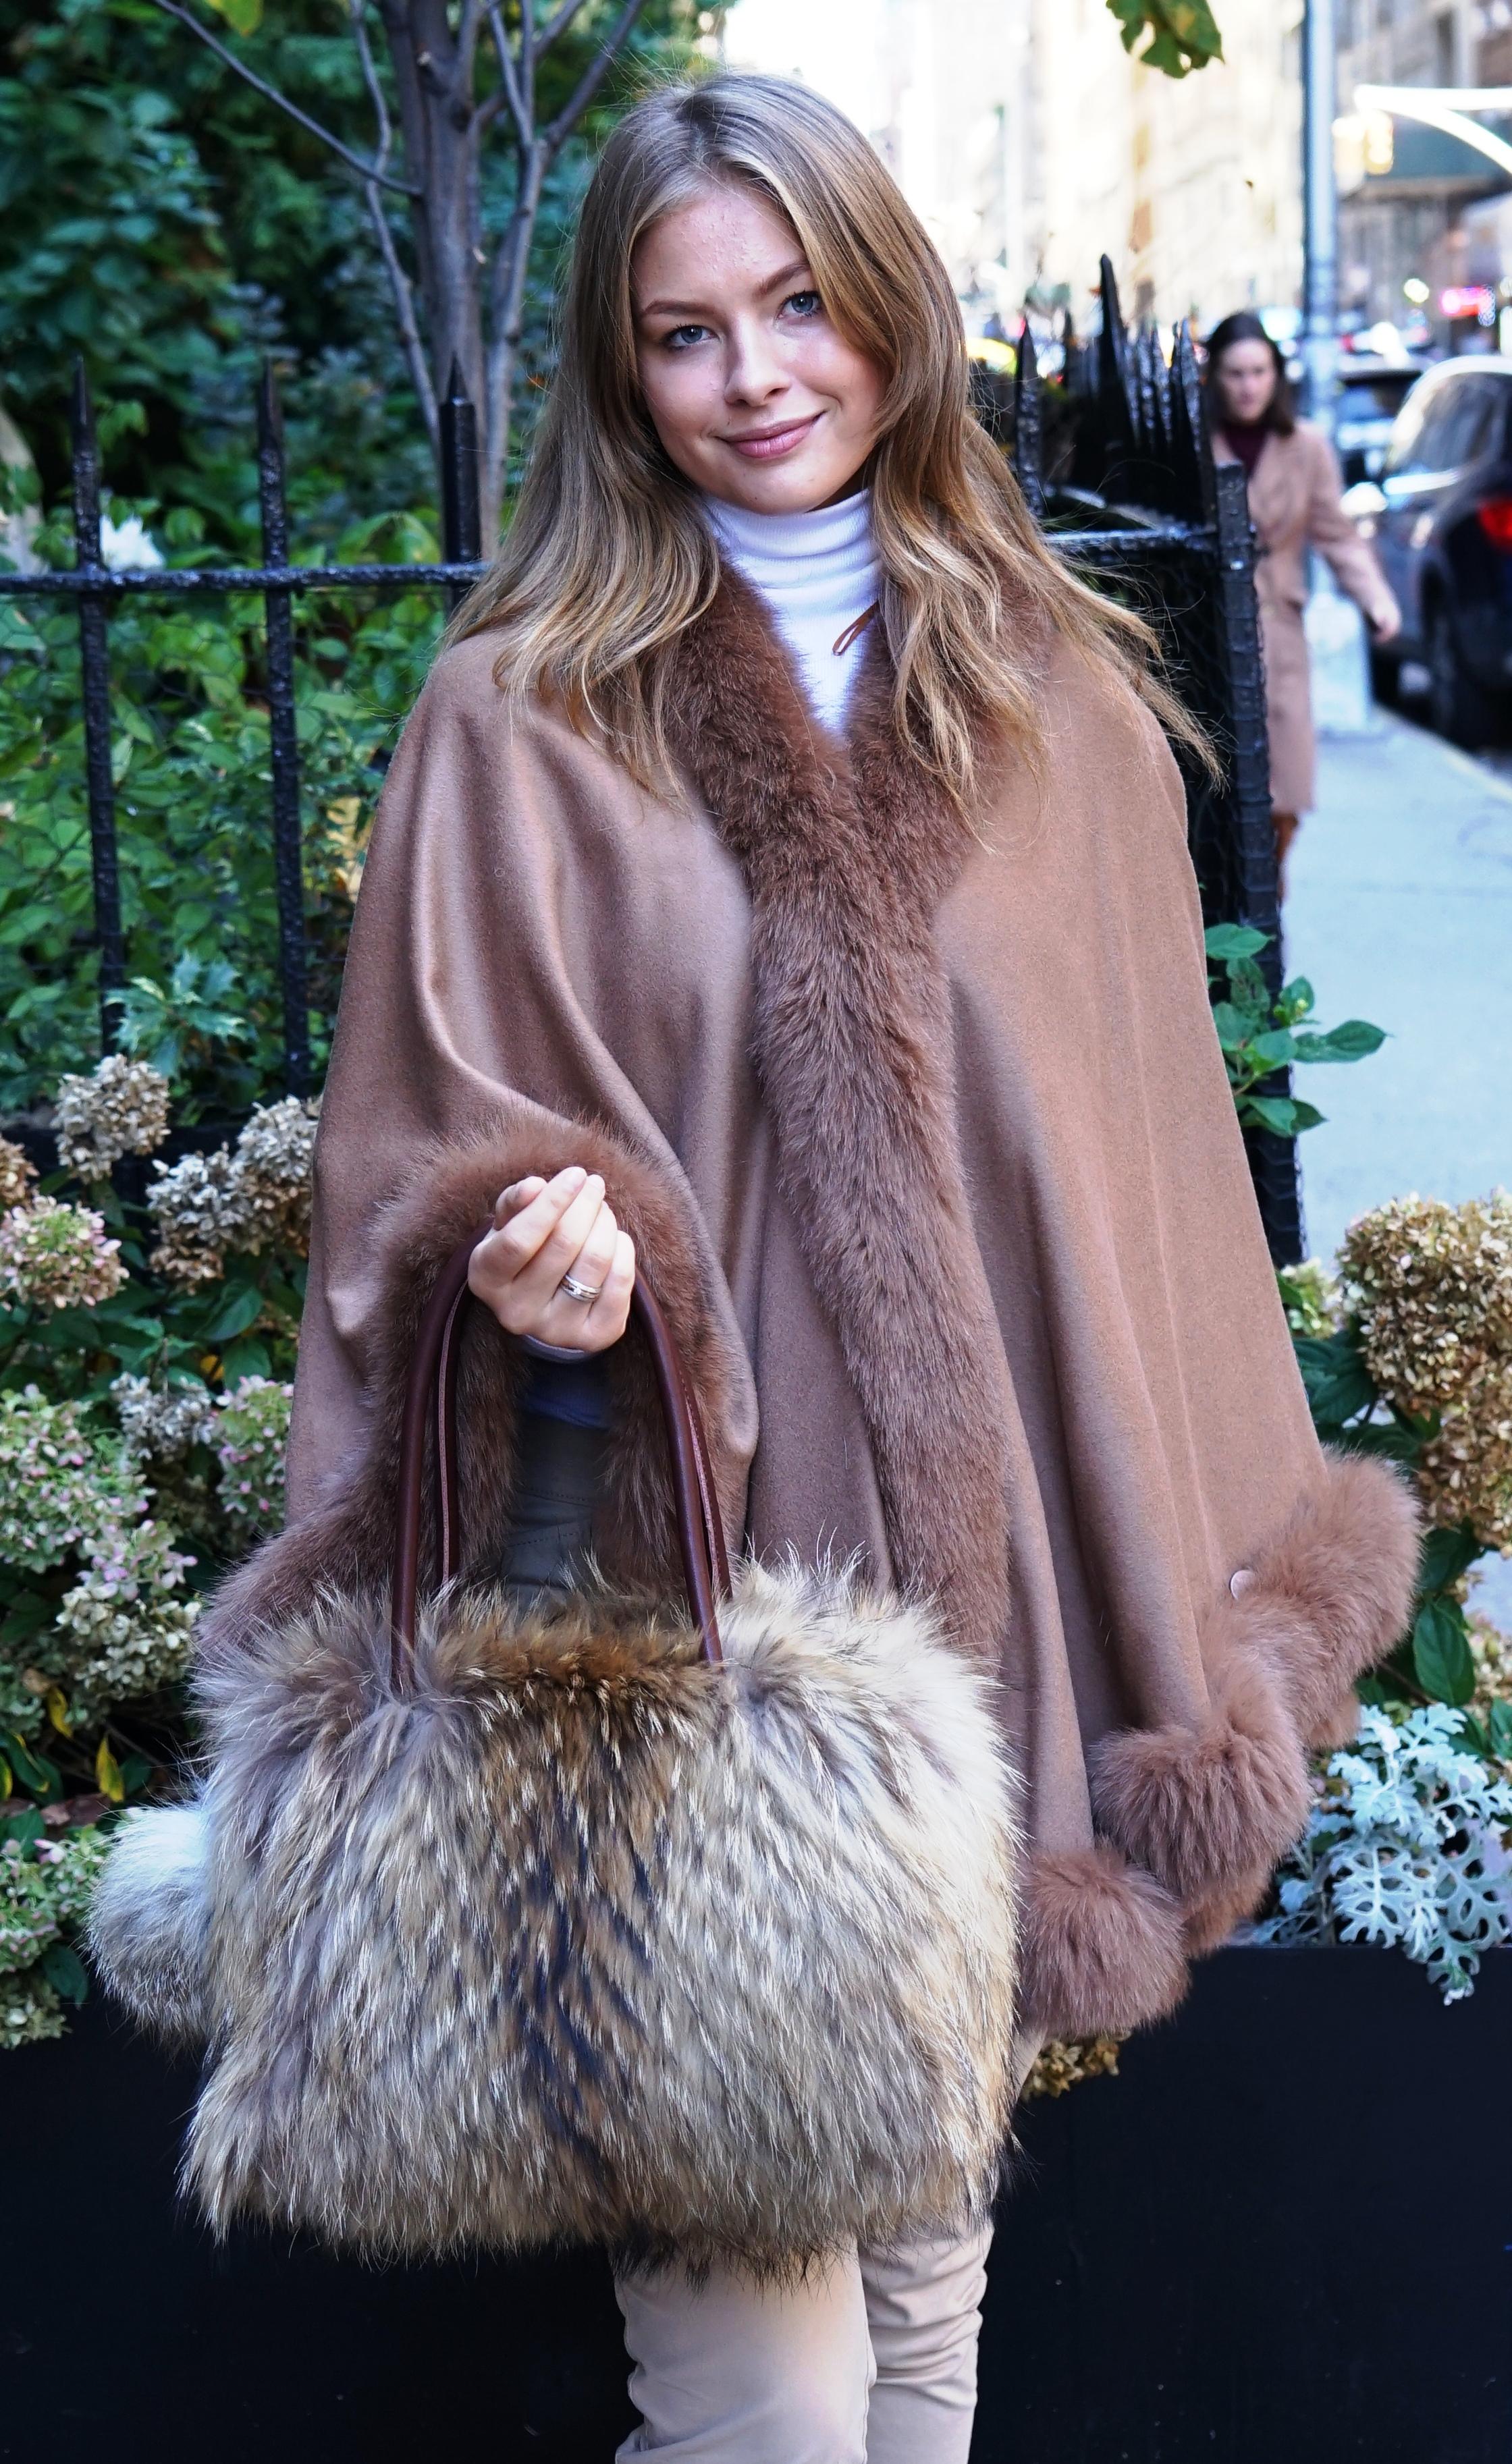 Finnish Raccoon Fur Pocketbook Camel Cashmere Cape Fox Trim